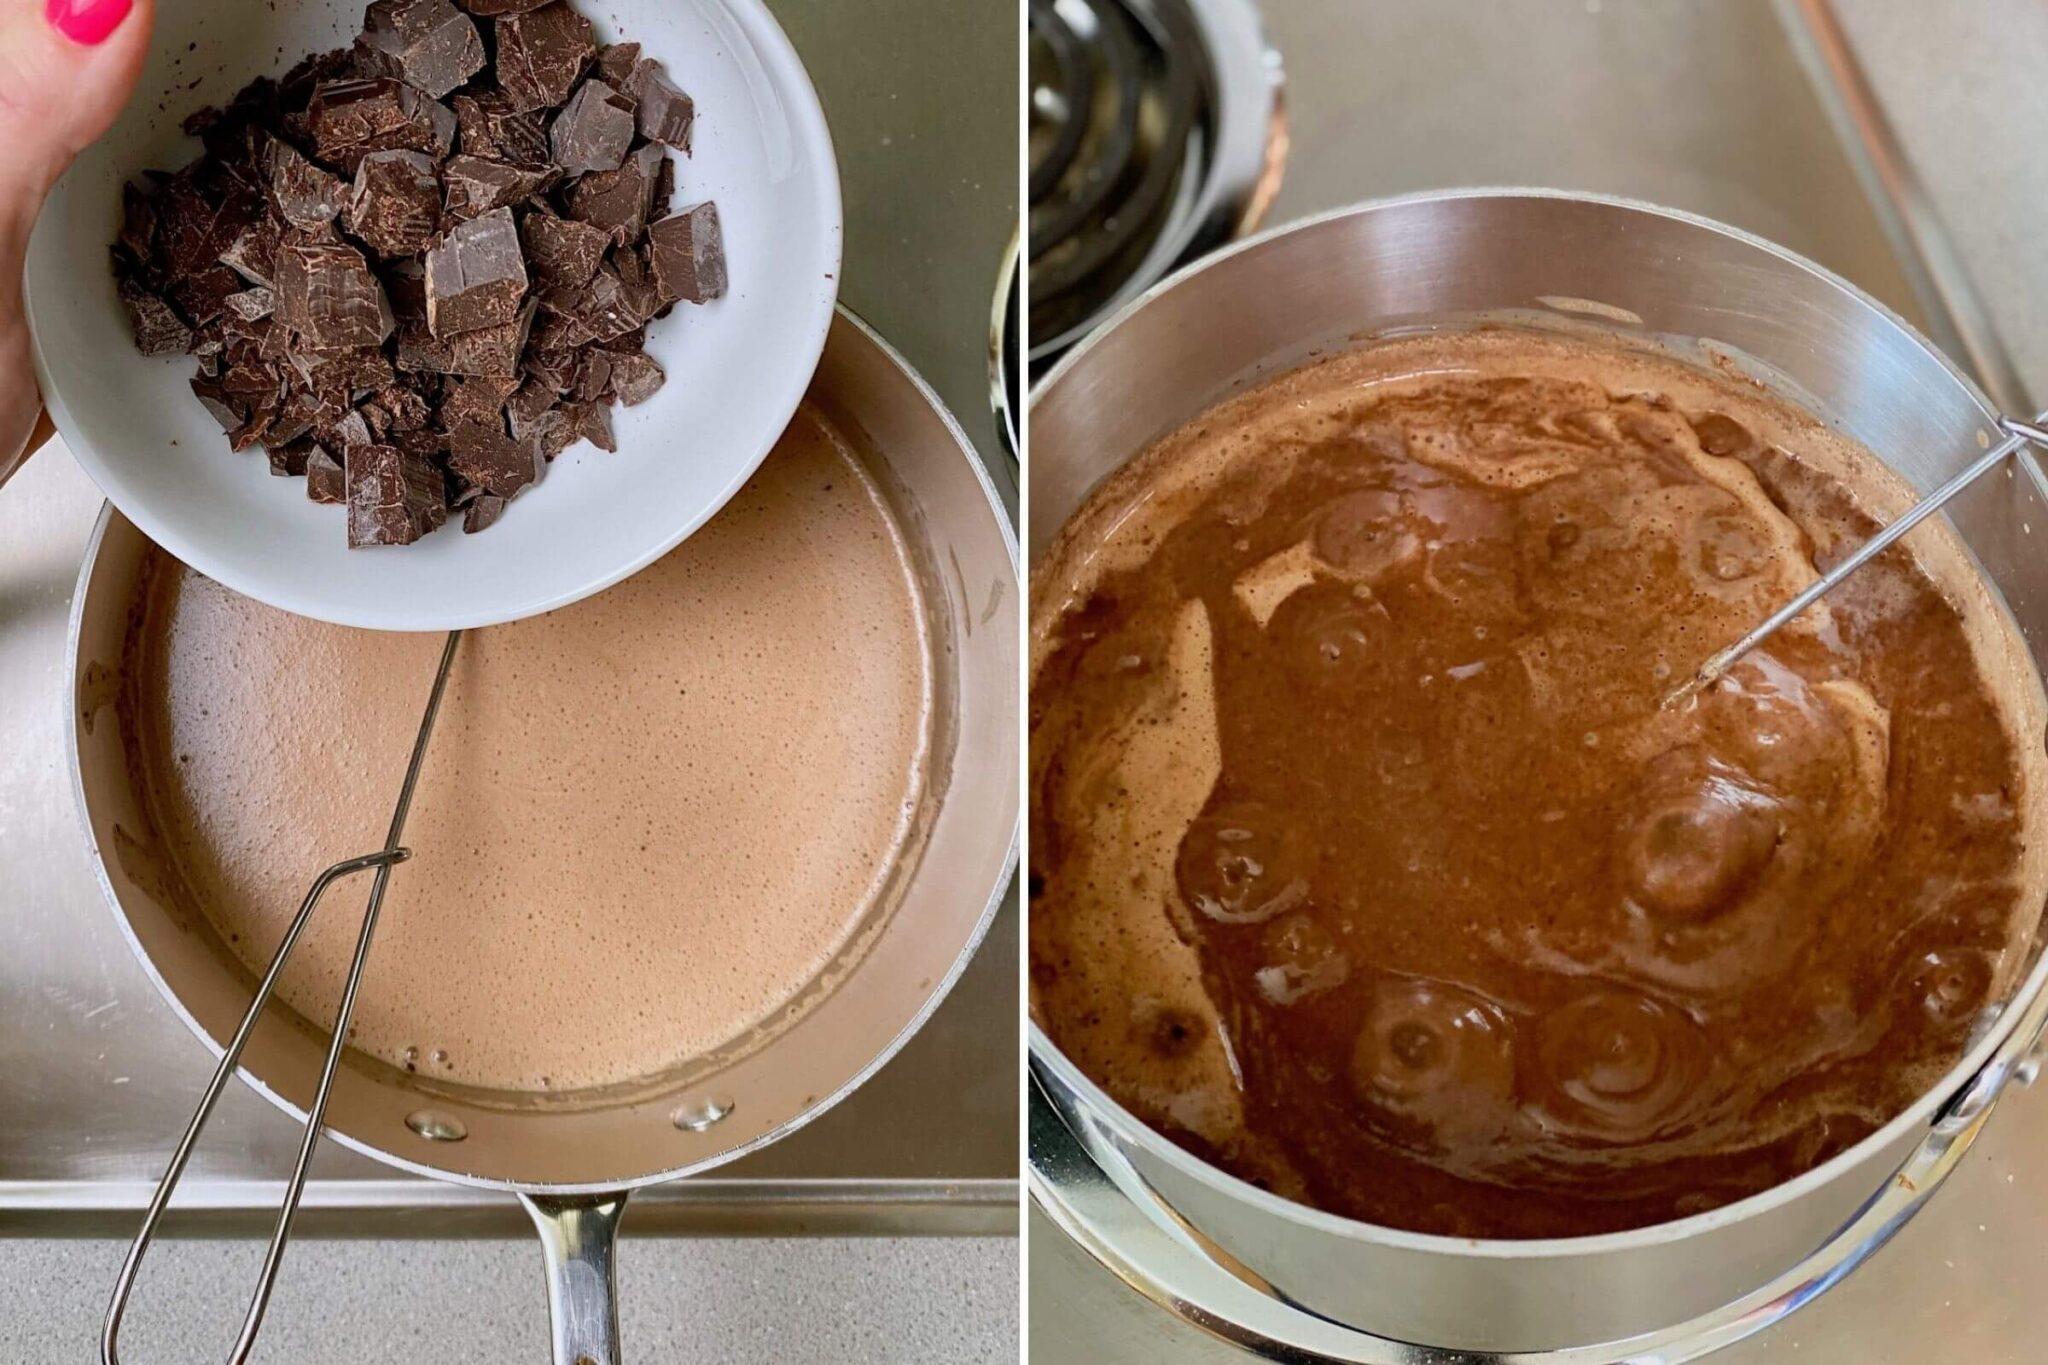 adding chocolate to ice cream mixture on stove